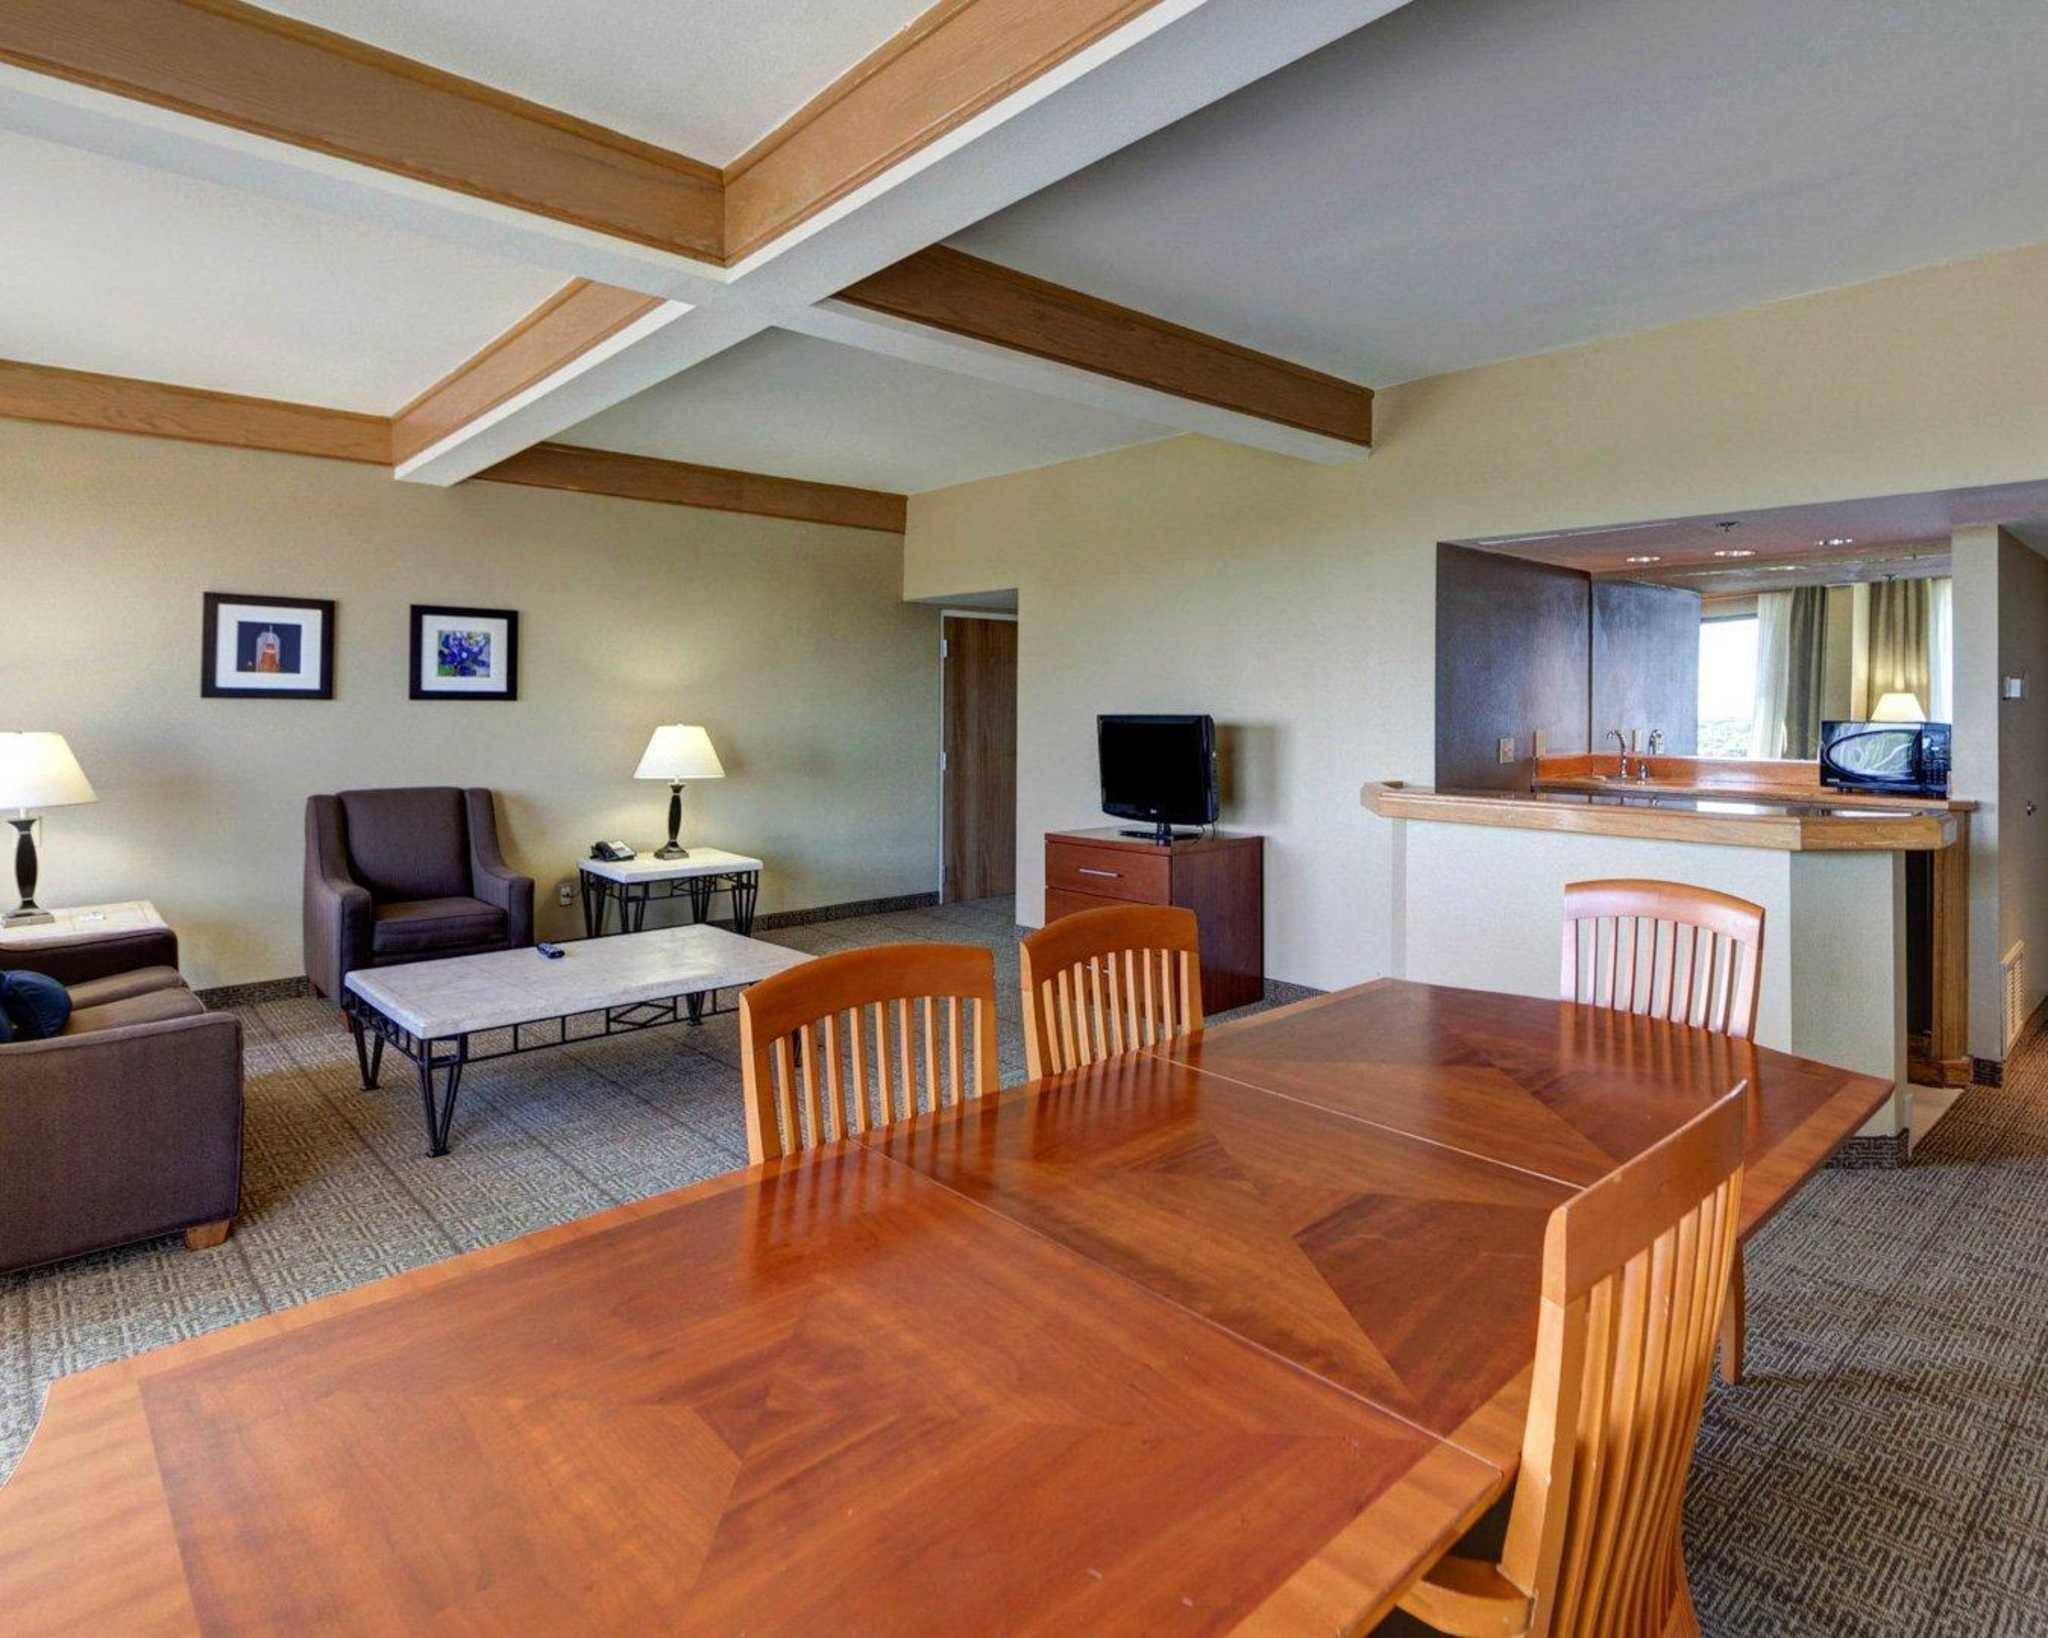 Comfort Inn & Suites Plano East image 49